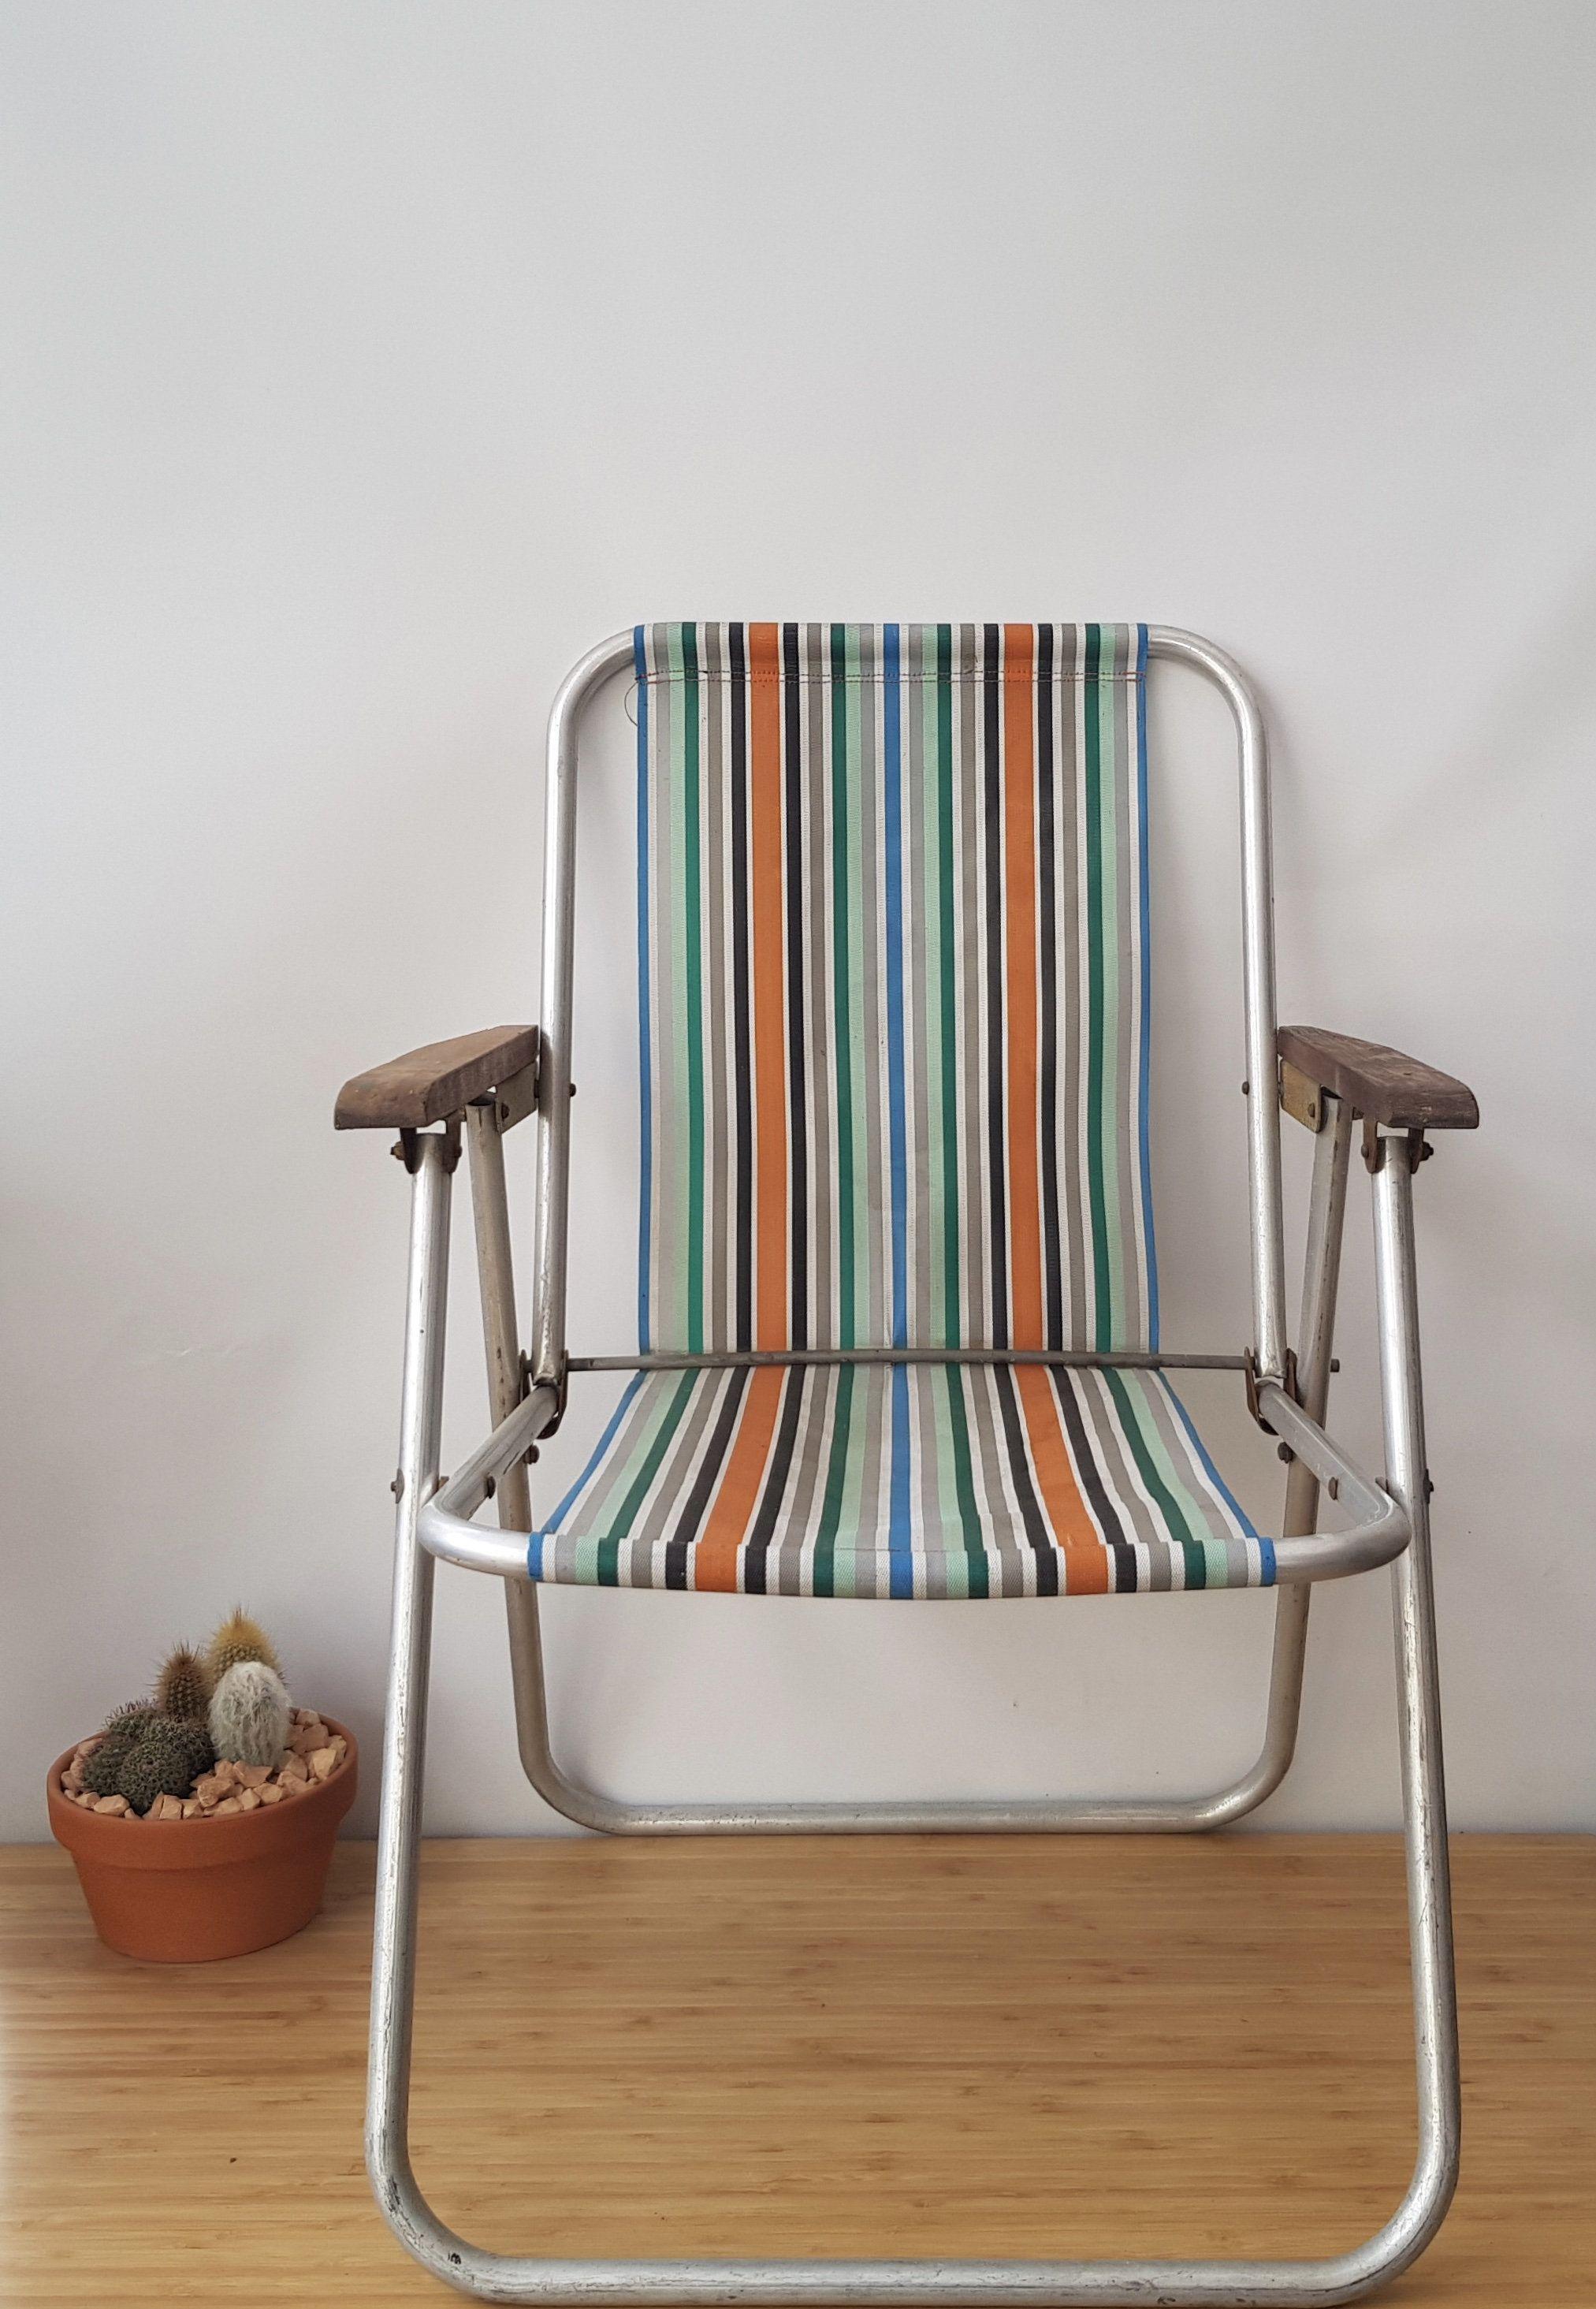 Vintage Folding Striped Deckchair Retro Boho Old Camping Chairs Old Deckchairs Old Garden Chairs Old Striped Chair Rustic Garden Chairs Striped Chair Rustic Chair Camping Chairs